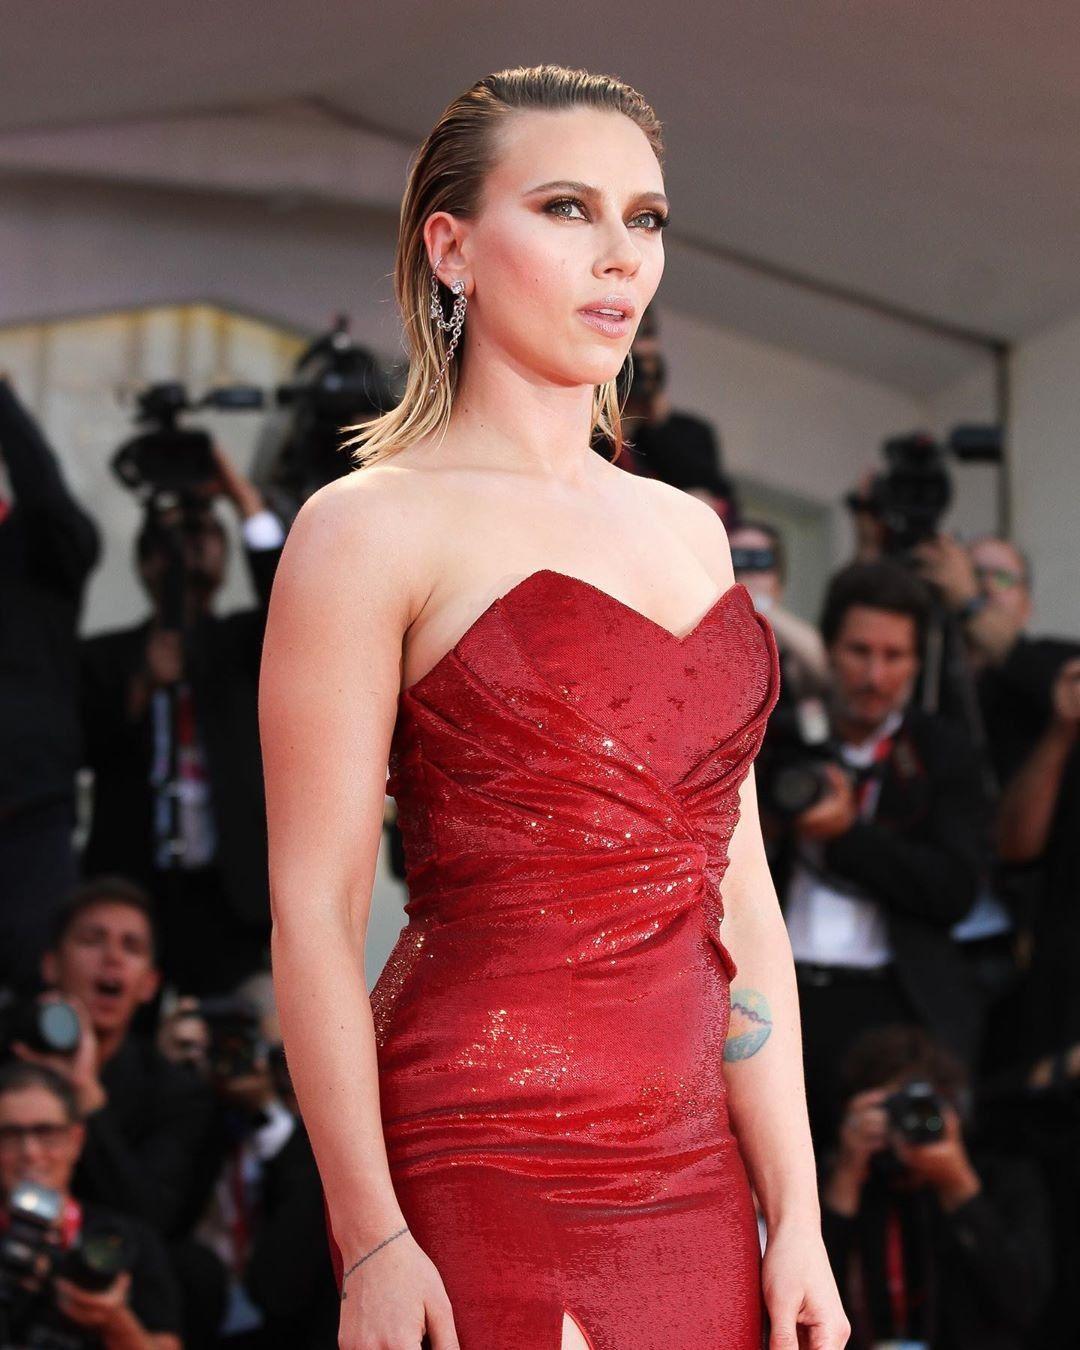 Hollywood hacker who leaked nude Scarlett Johansson photos